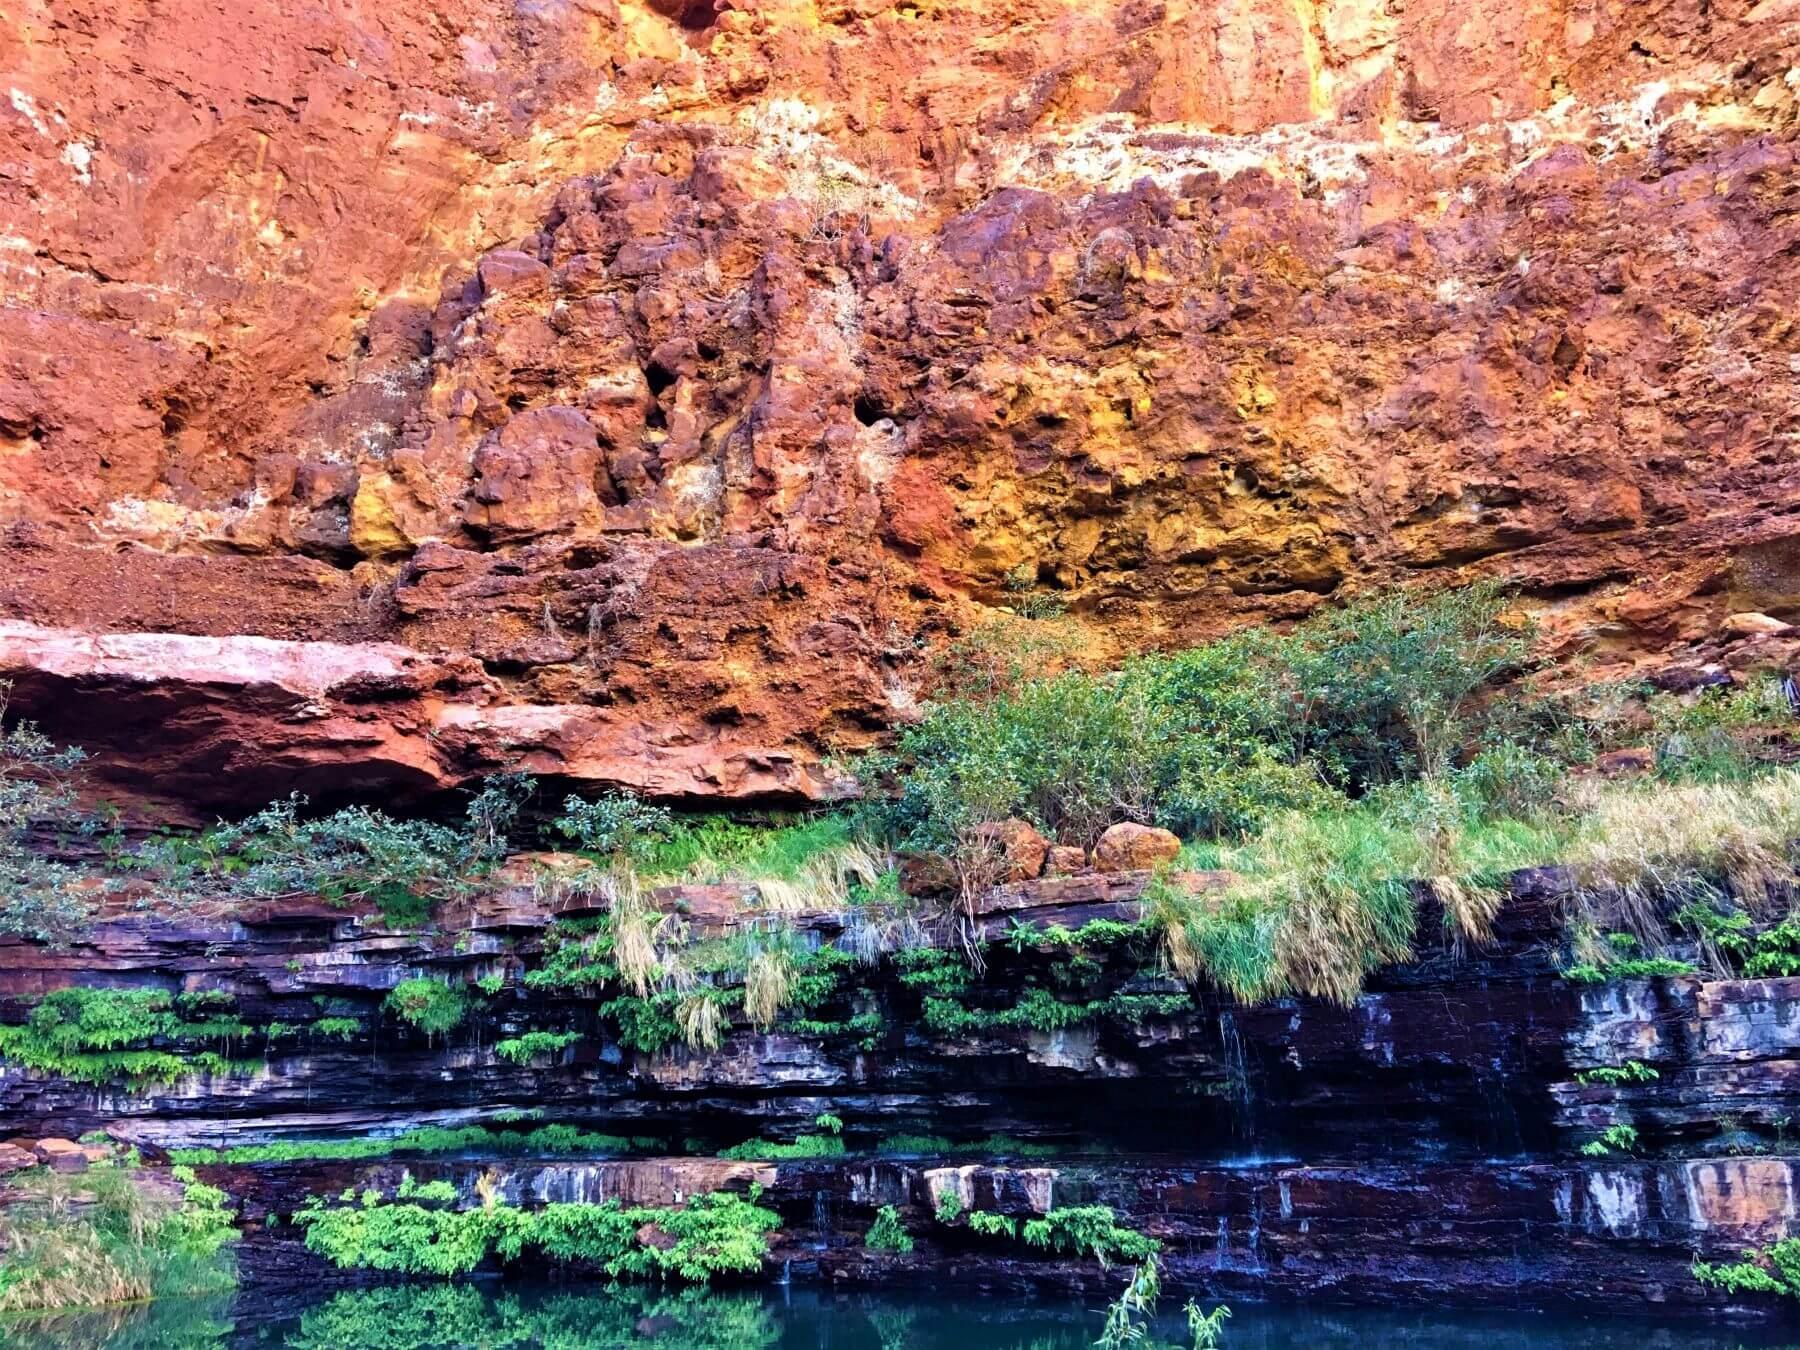 Schöne Dales Gorge im Karijini National Park in Australien